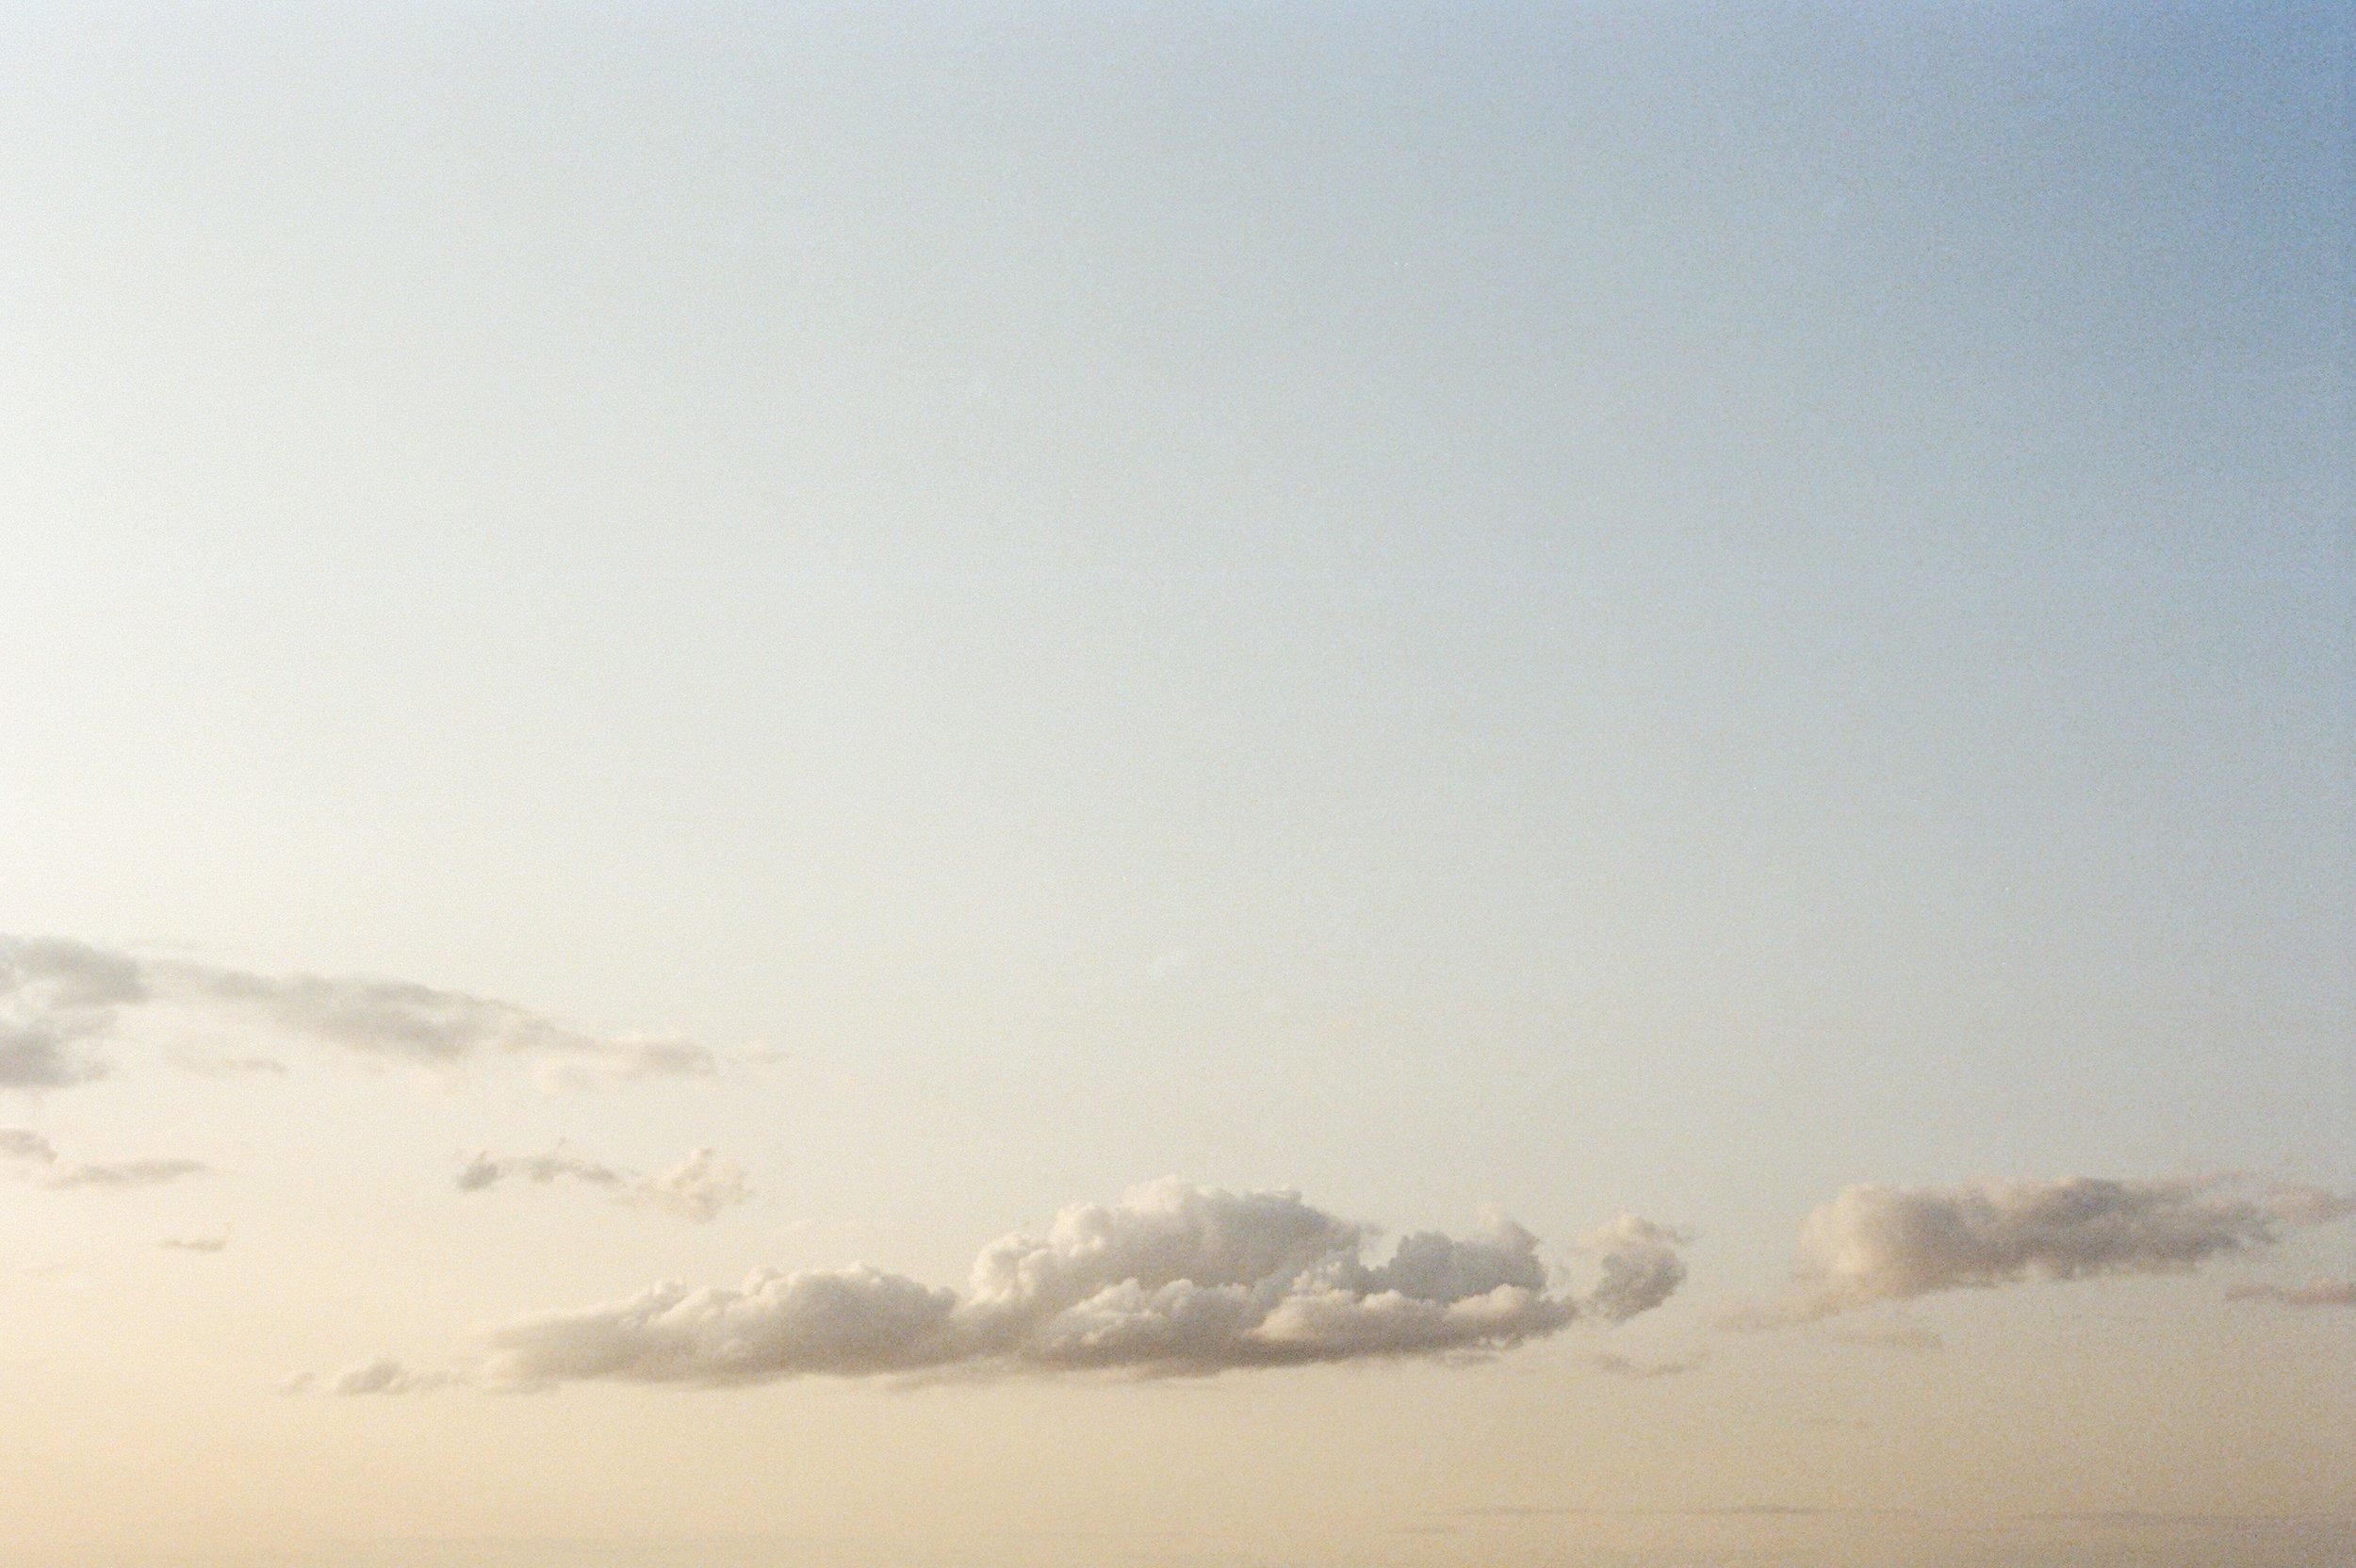 clouds_cloud_film_photographer_emily_walker_2.jpg